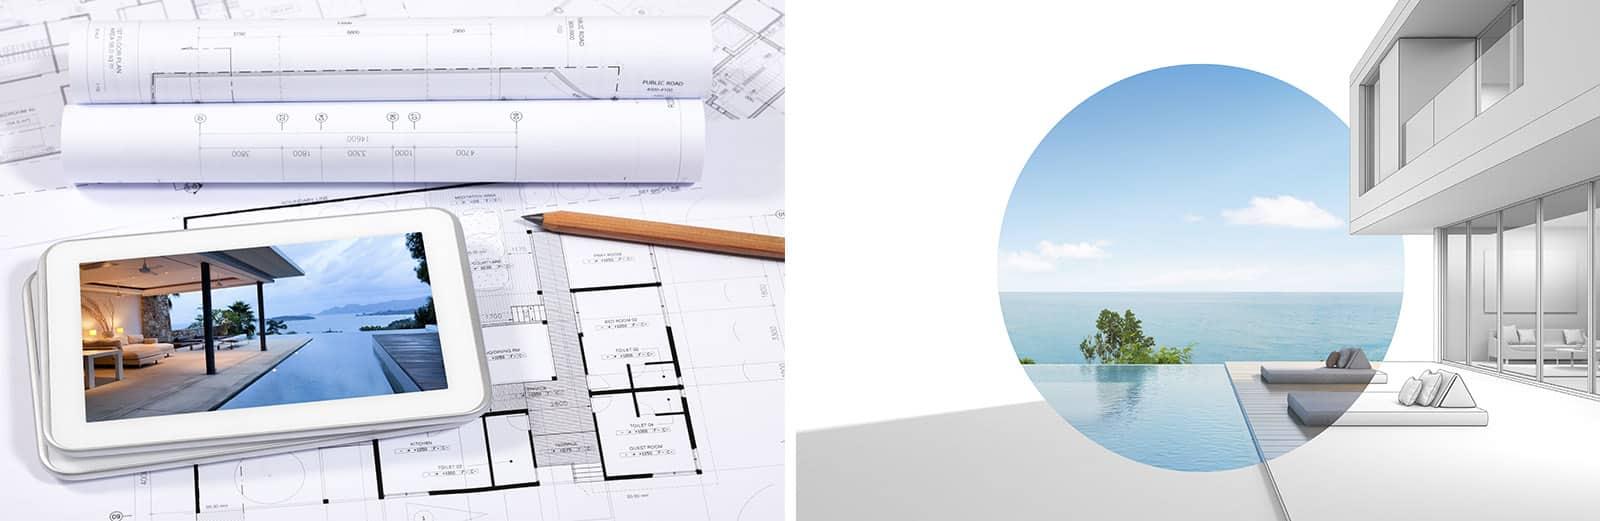 Spa Advisors Conceptual Plans